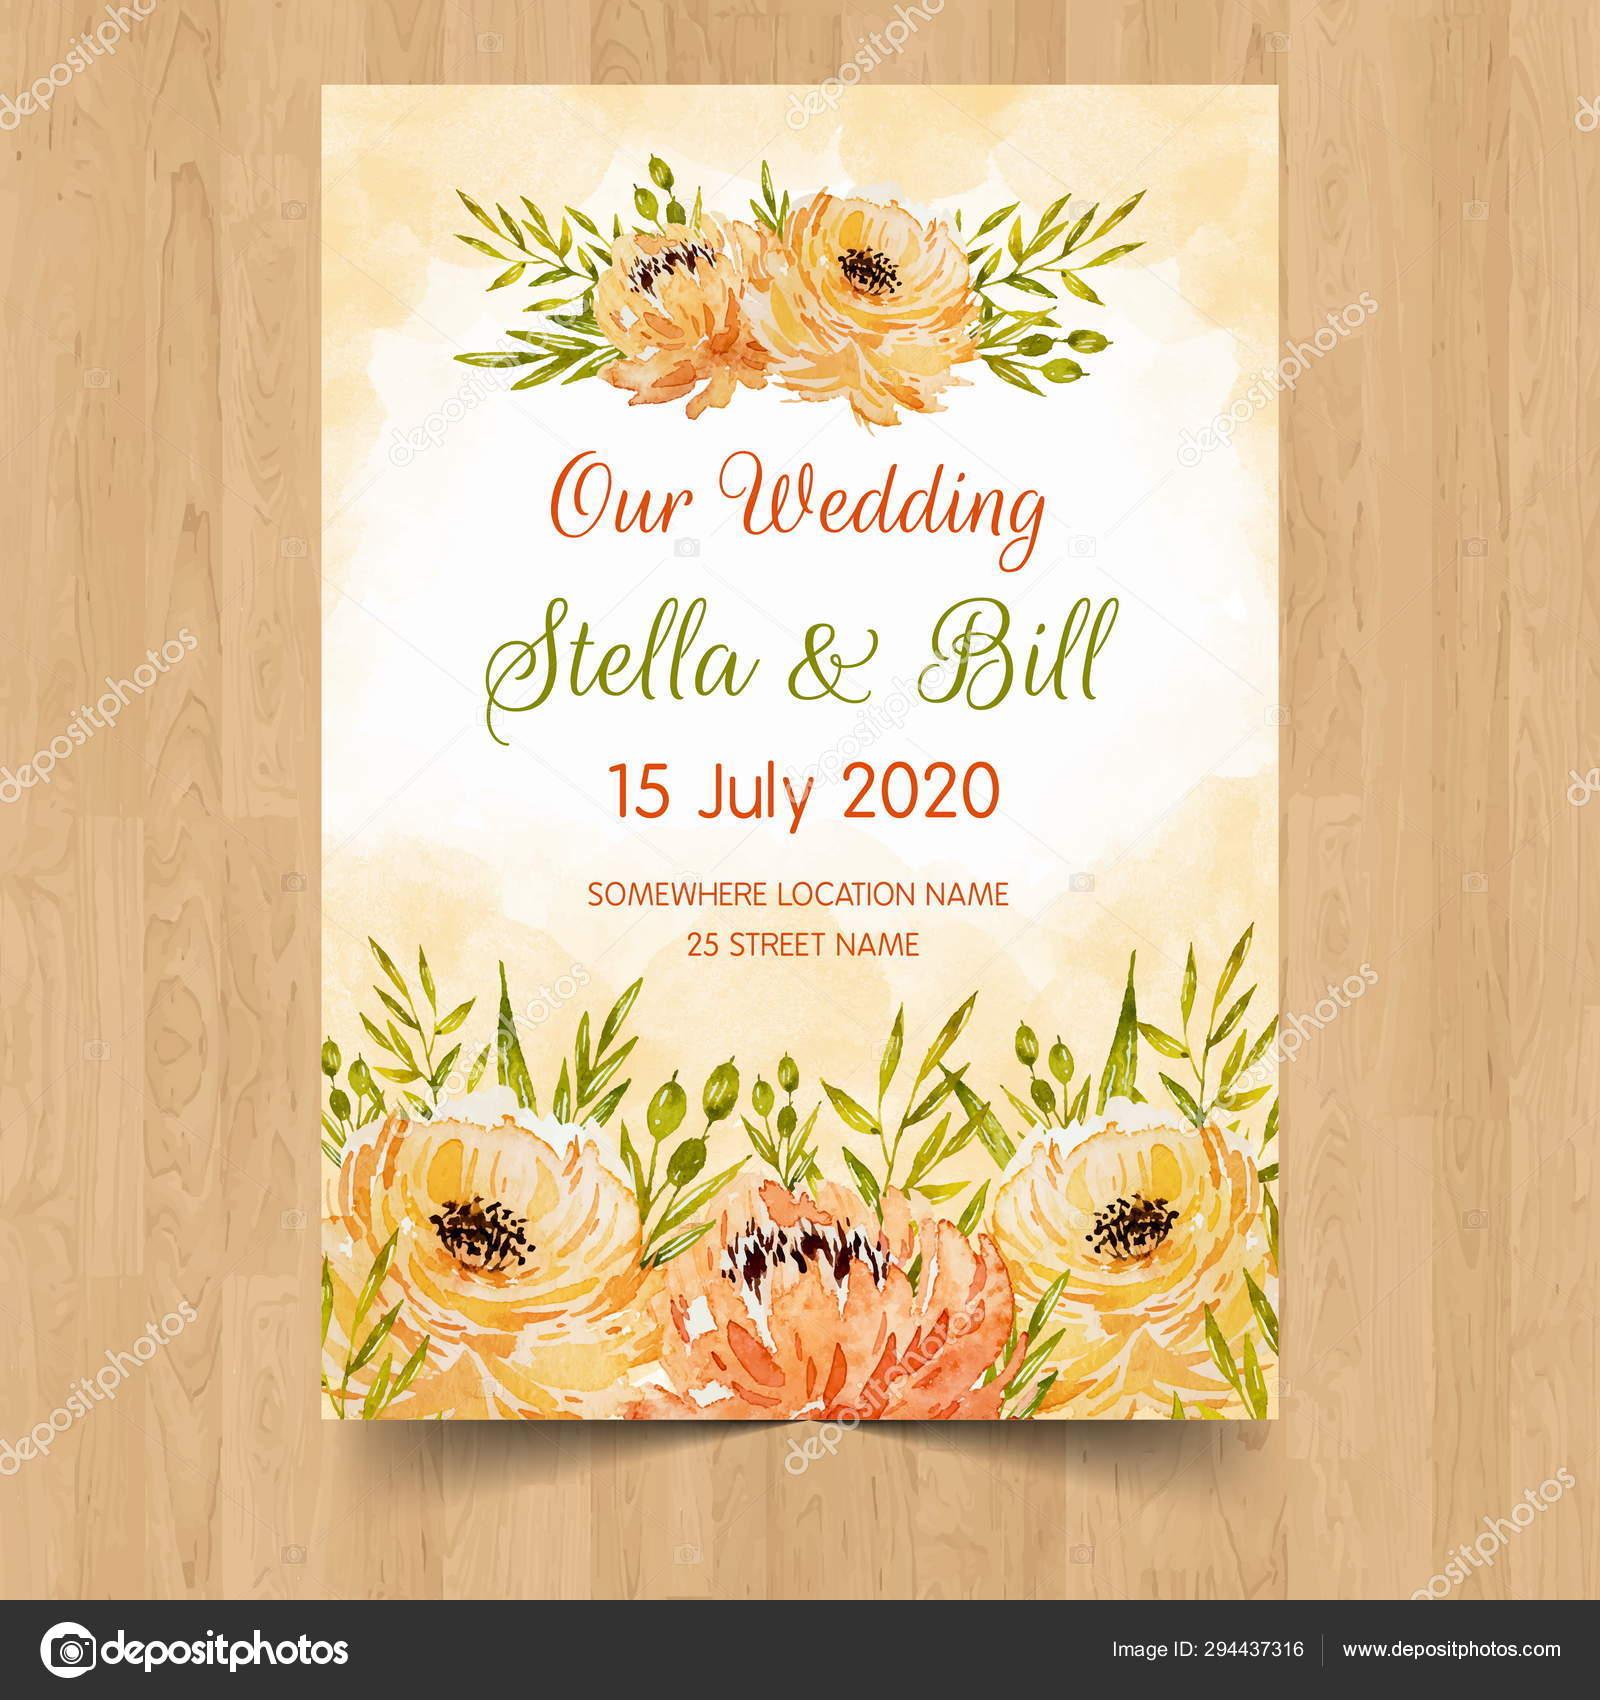 Date Wedding Invitation Card Design Flower Lovely Wedding